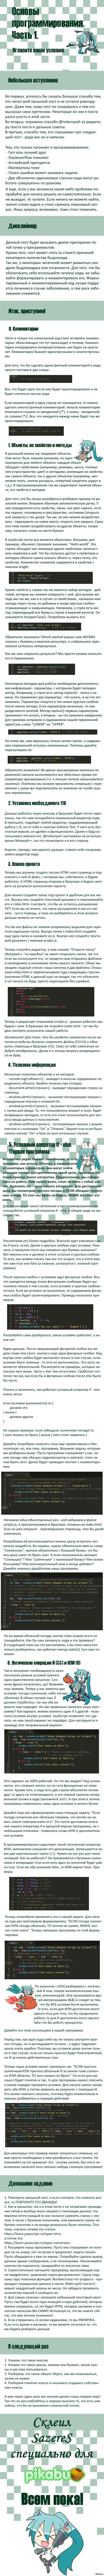 "Основы программирования. Часть 1. Ссылка на прошлую часть: <a href=""http://pikabu.ru/story/osnovyi_programmirovaniya_chast_0_3219983"">http://pikabu.ru/story/_3219983</a>"